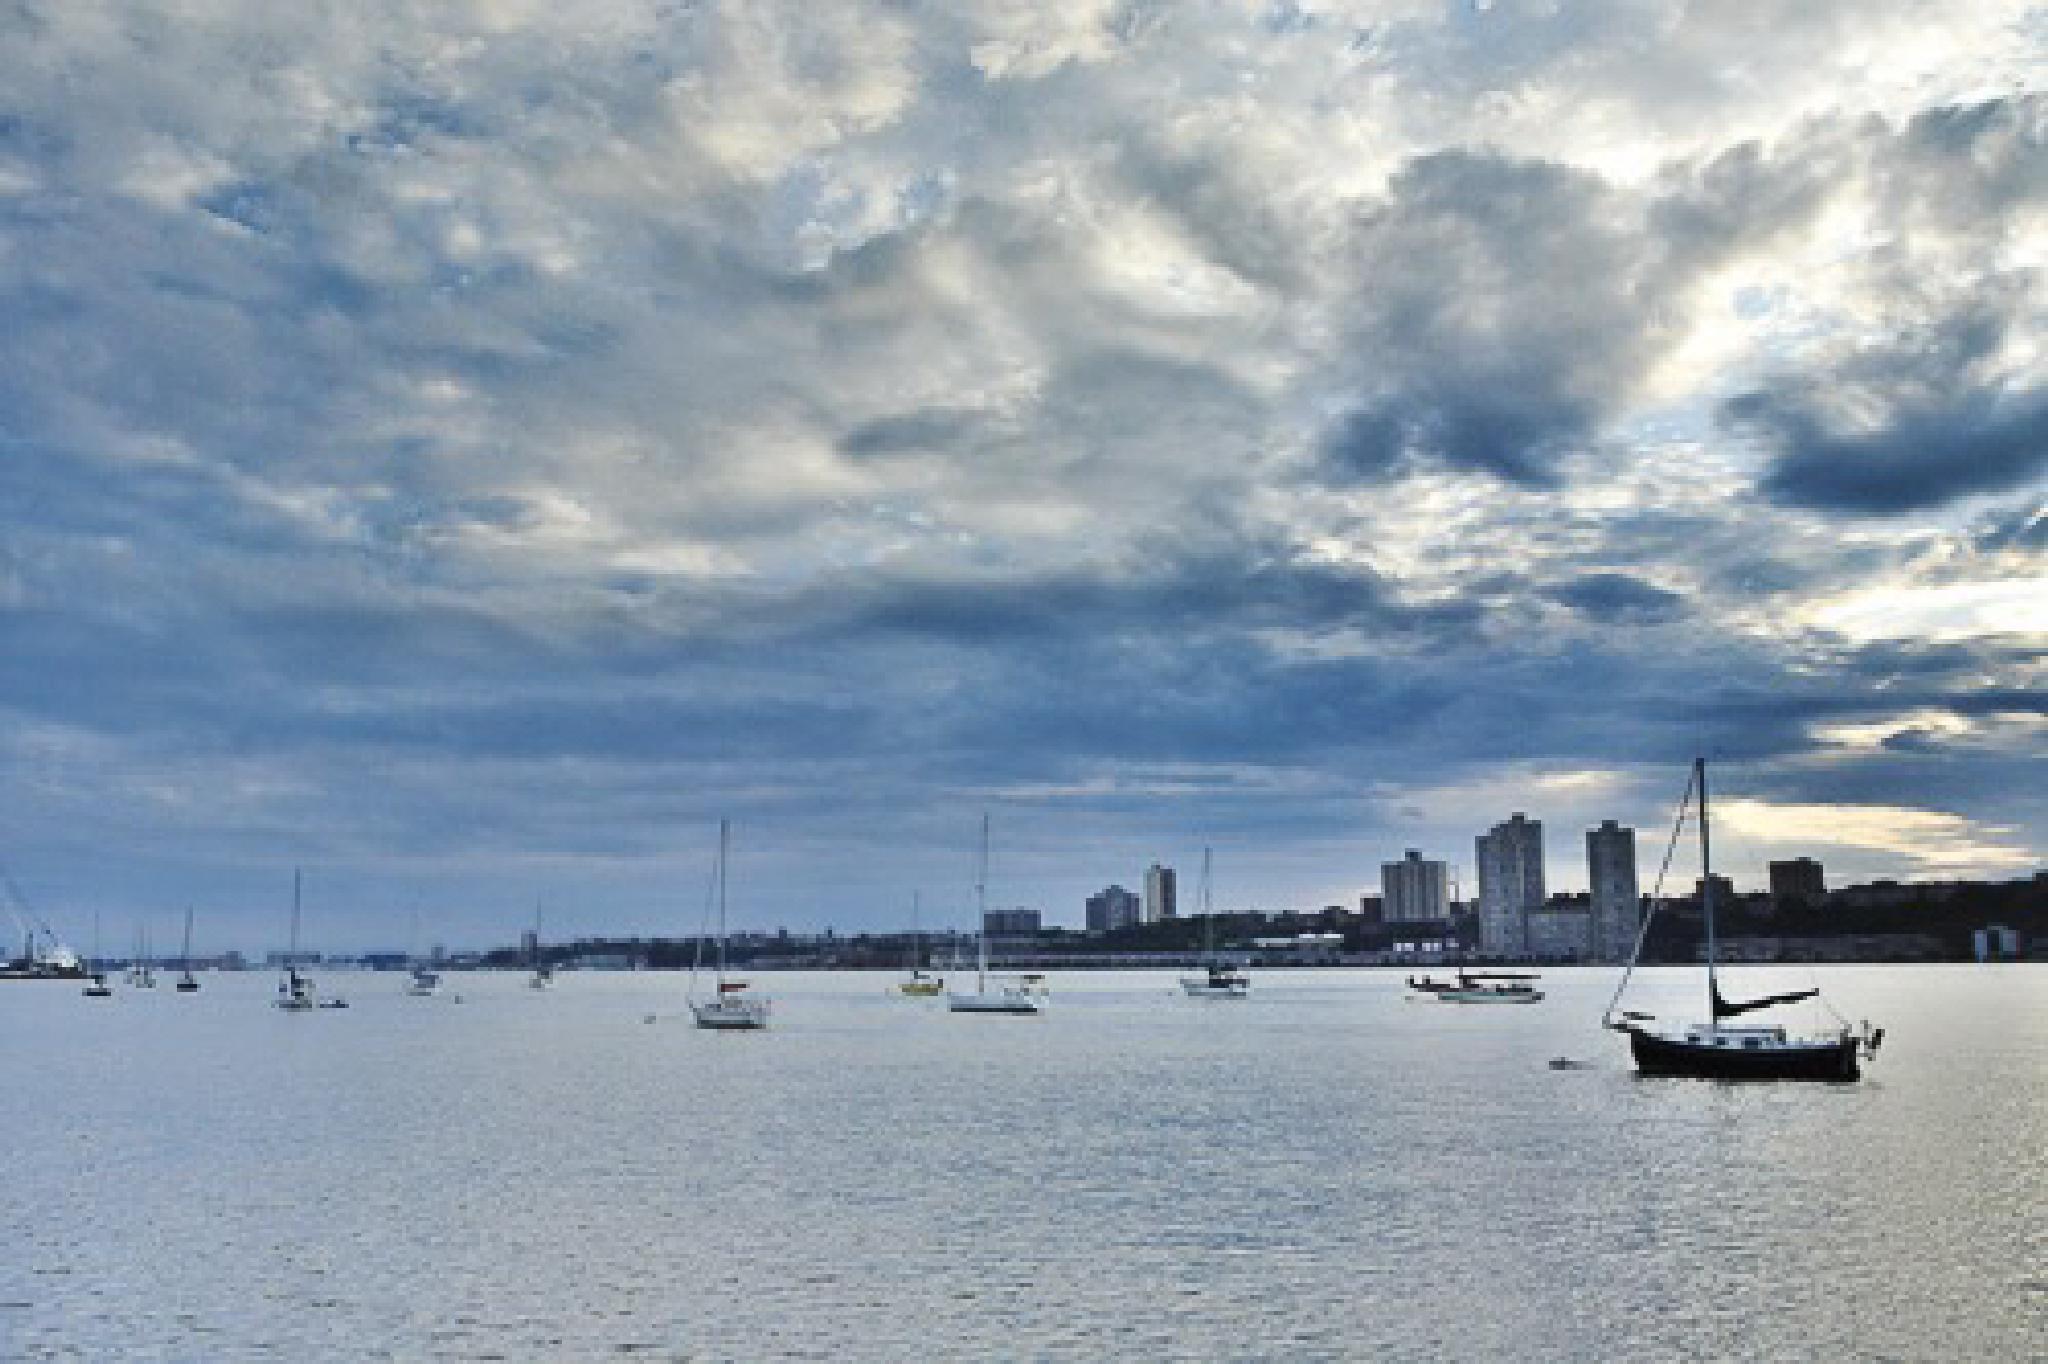 Sailboats dot NYC's Hudson River  by Sharon Winter-Schorr